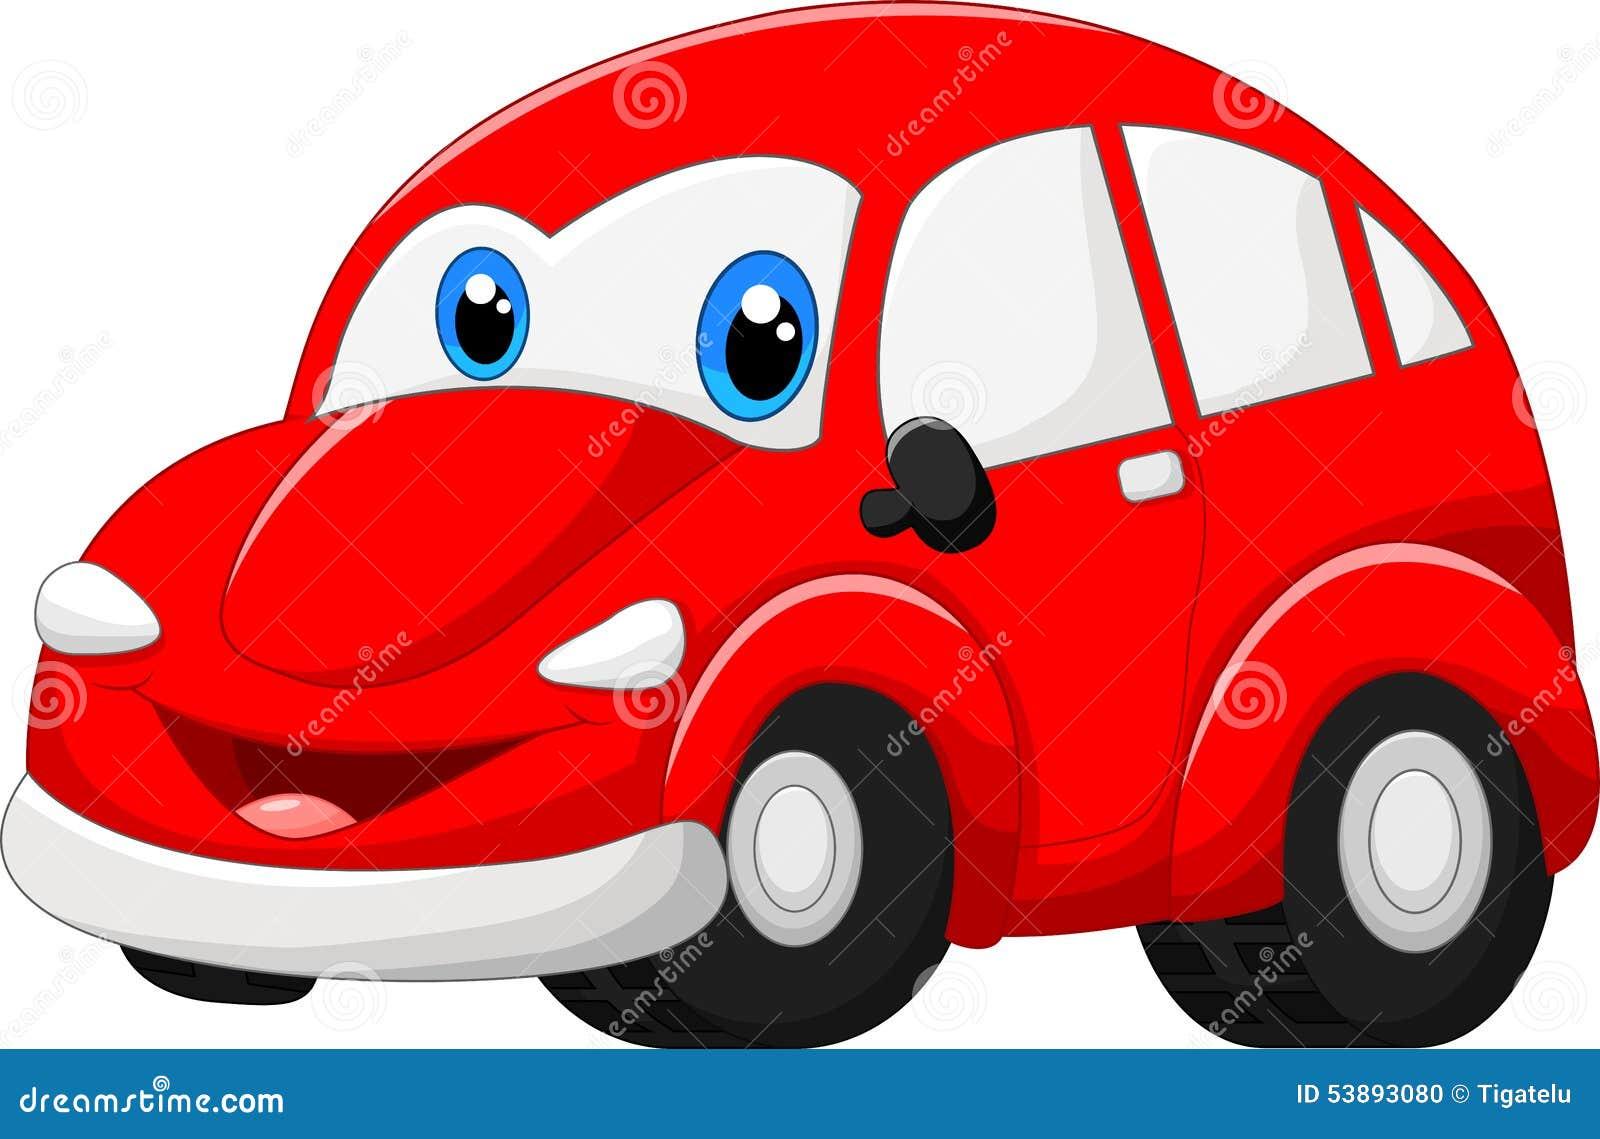 cartoon red car stock vector image 53893080. Black Bedroom Furniture Sets. Home Design Ideas